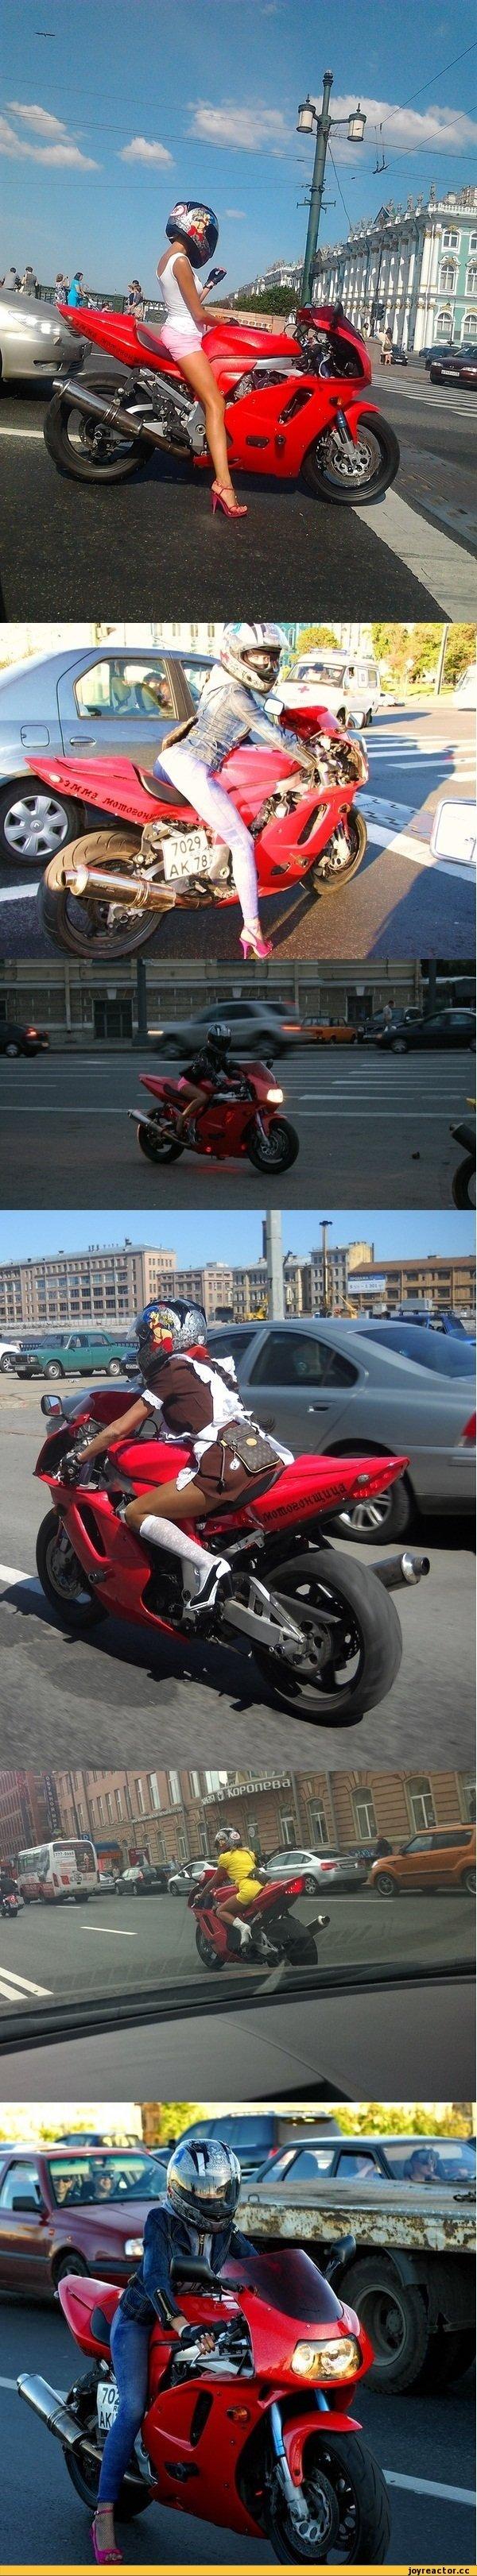 girl riding big red thing. fap fap fap fap.. Damn that girl makes that bike look good. fap fap fap fap